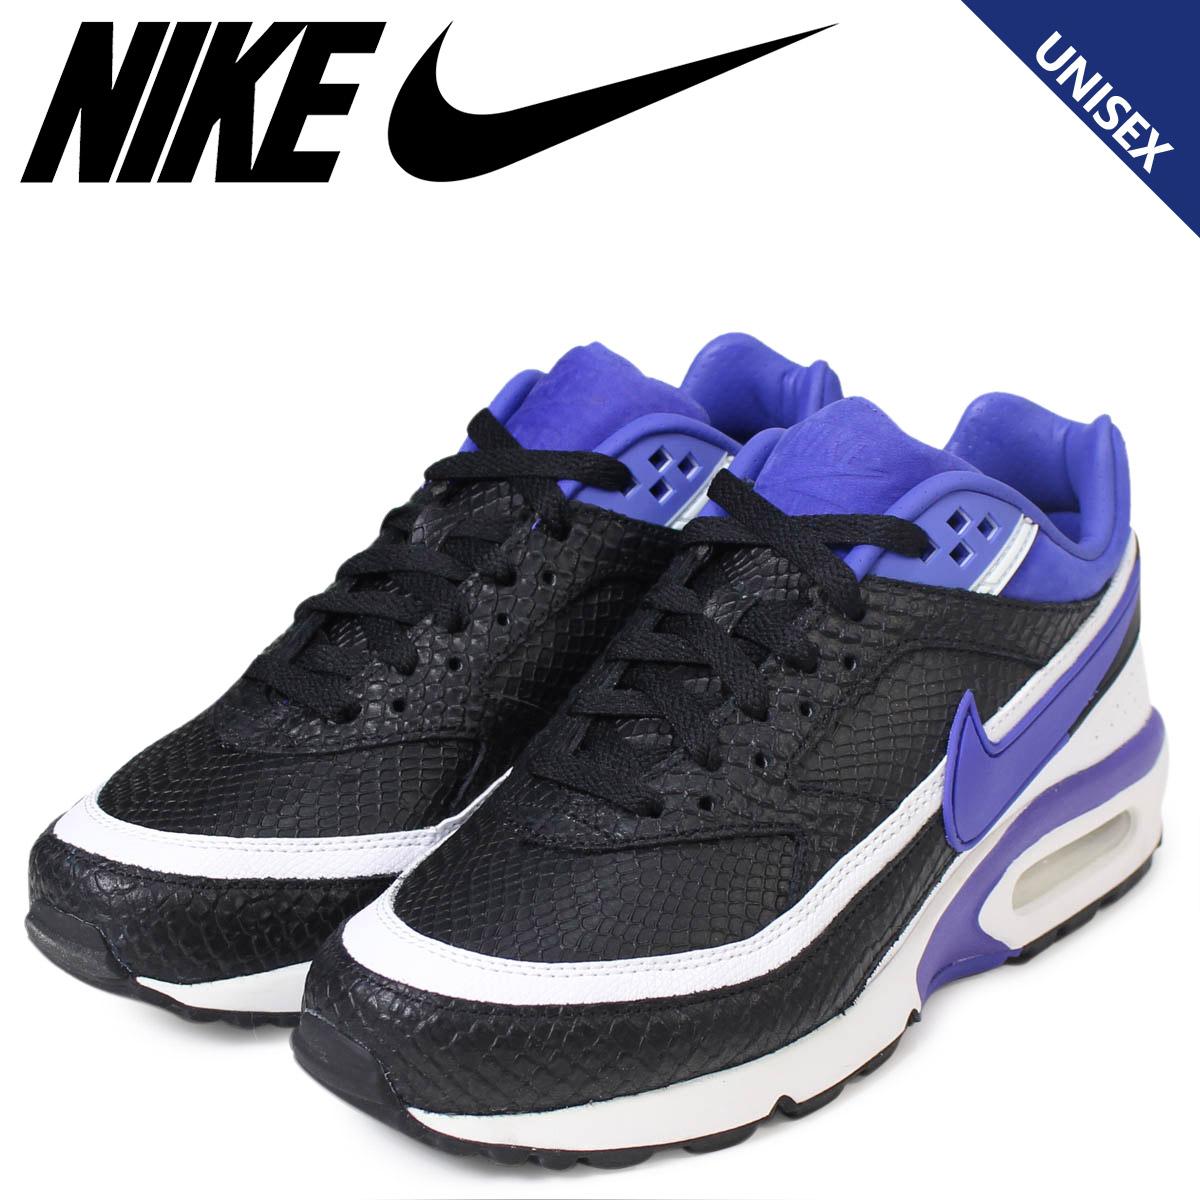 NIKE AIR MAX BW OG Kie Ney AMAX men gap Dis sneakers 819,522-051 shoes black